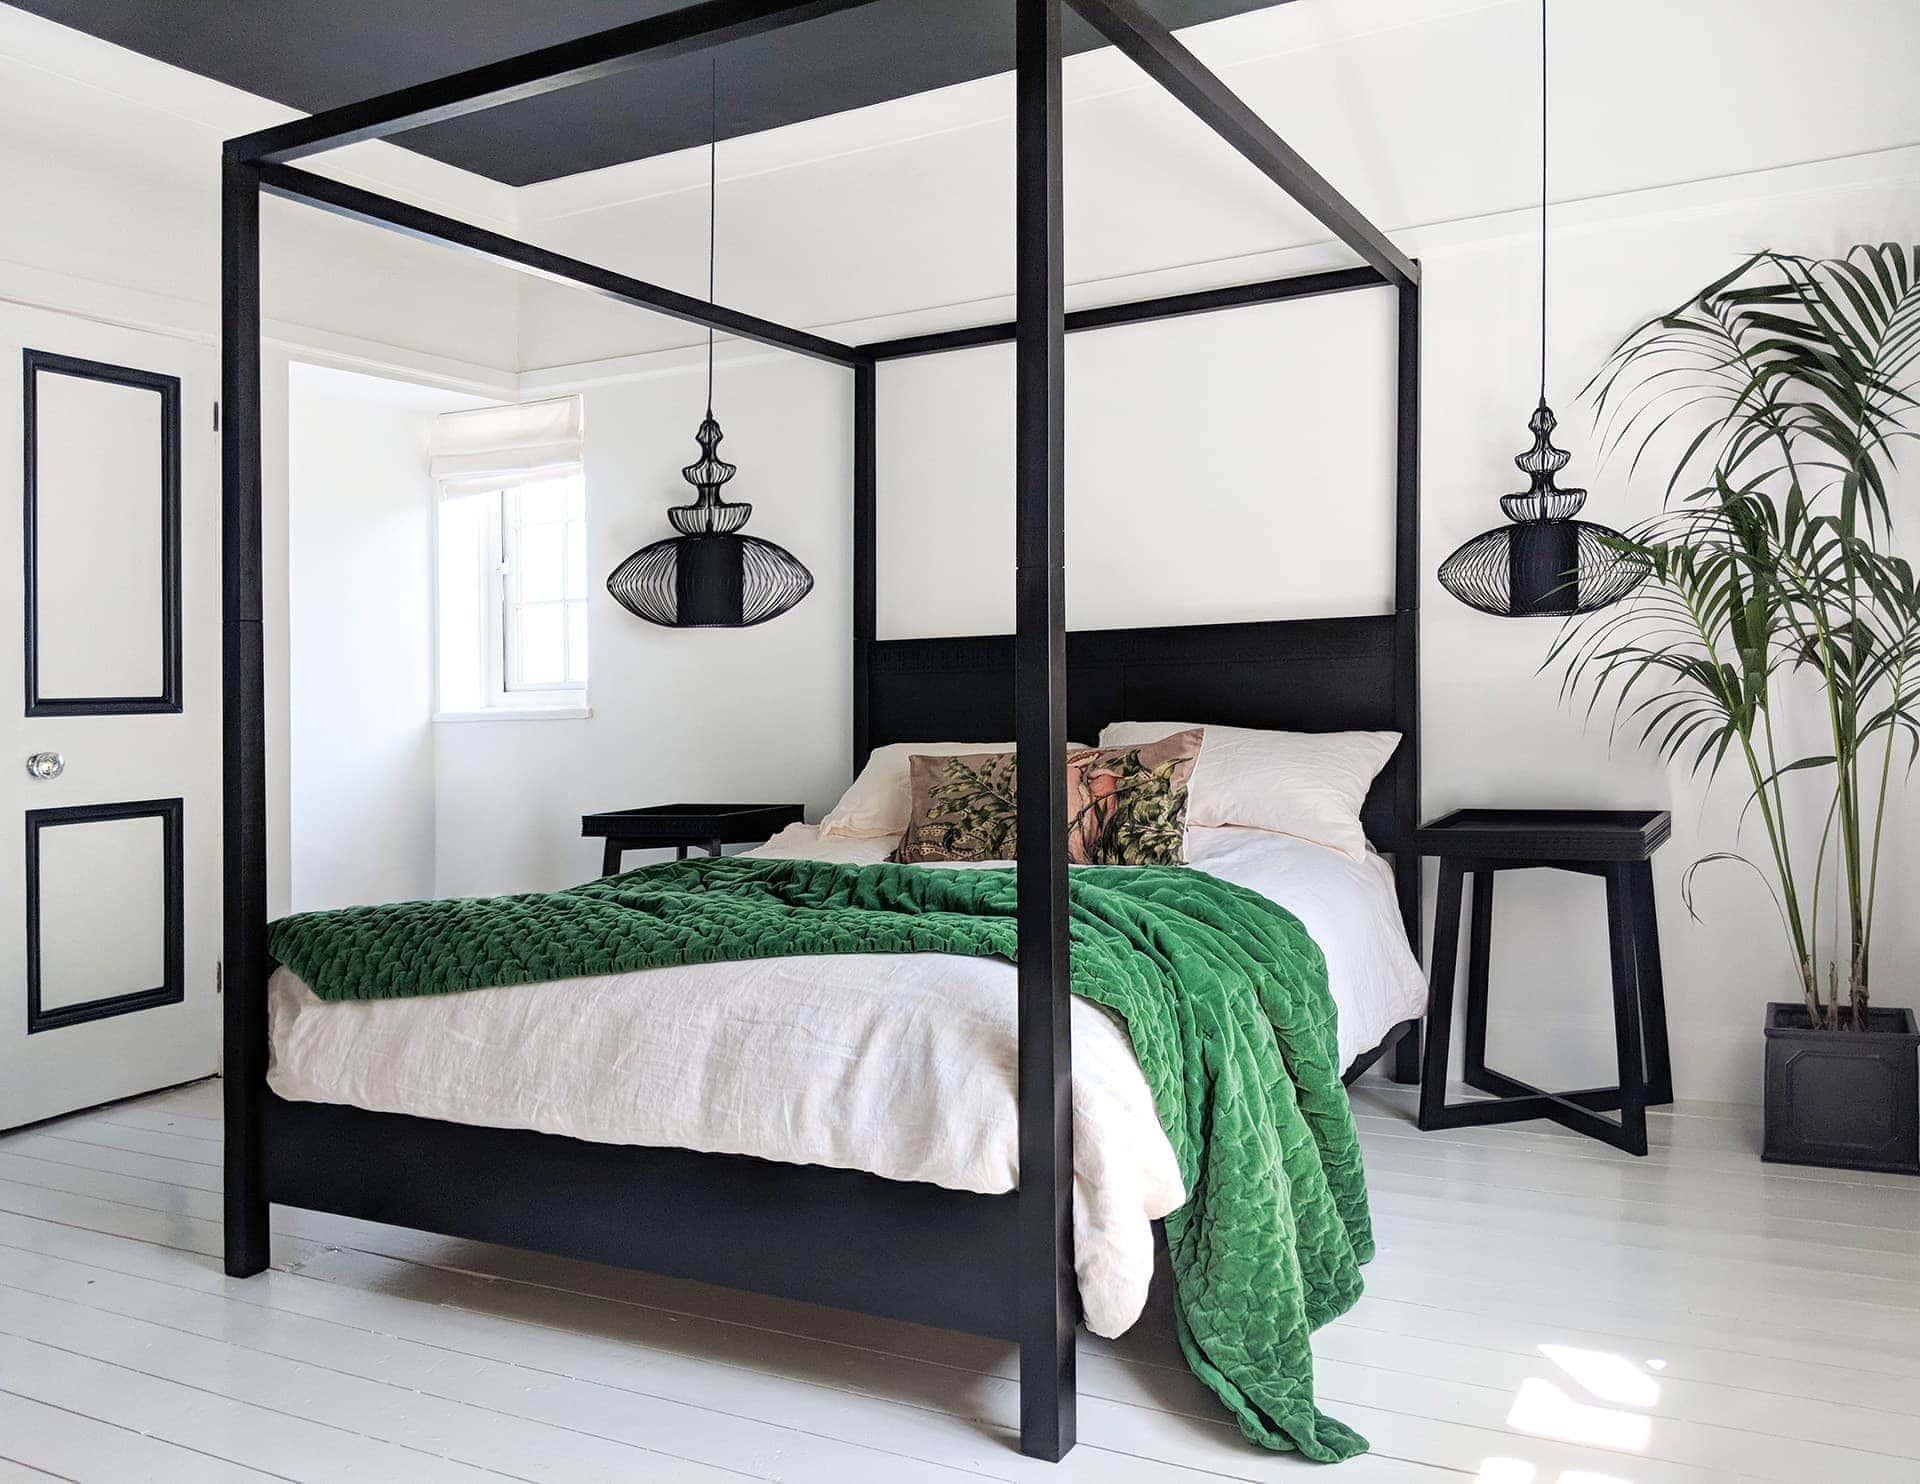 TLC Interiors & Cheats on Choosing Pendant Lights for a Master Bedroom